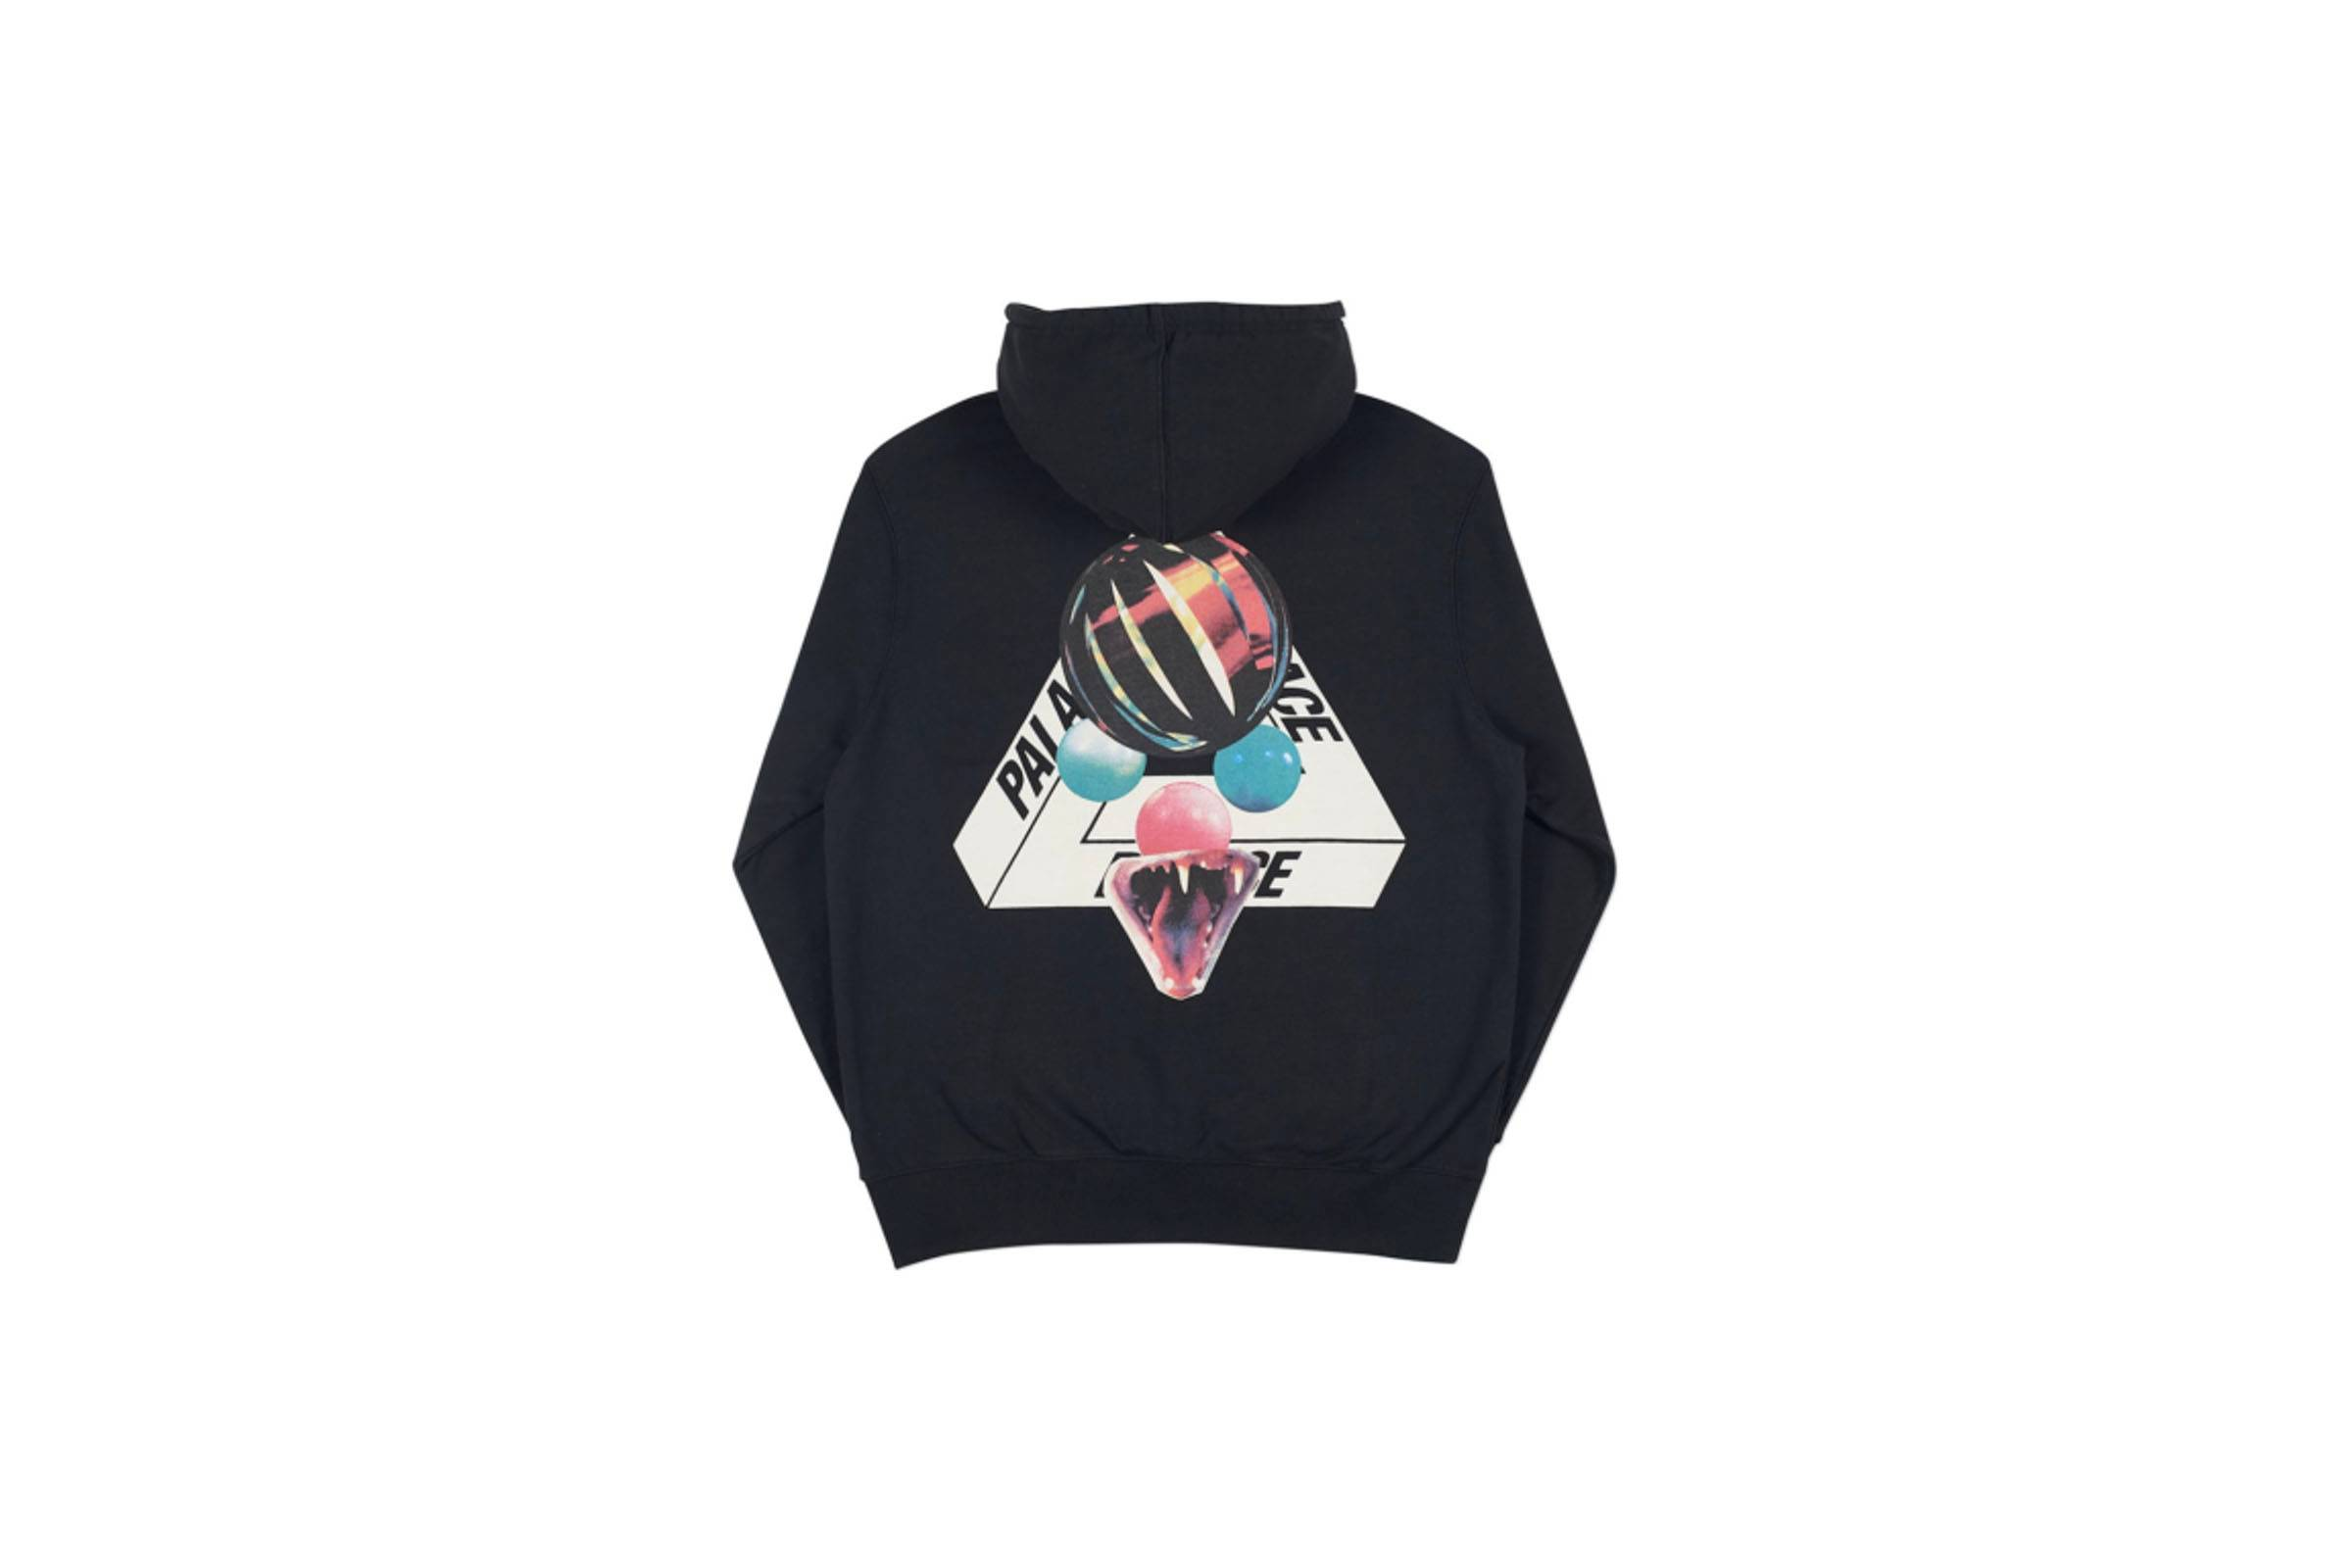 Streetwear Steals Saturdays: June 8, 2019